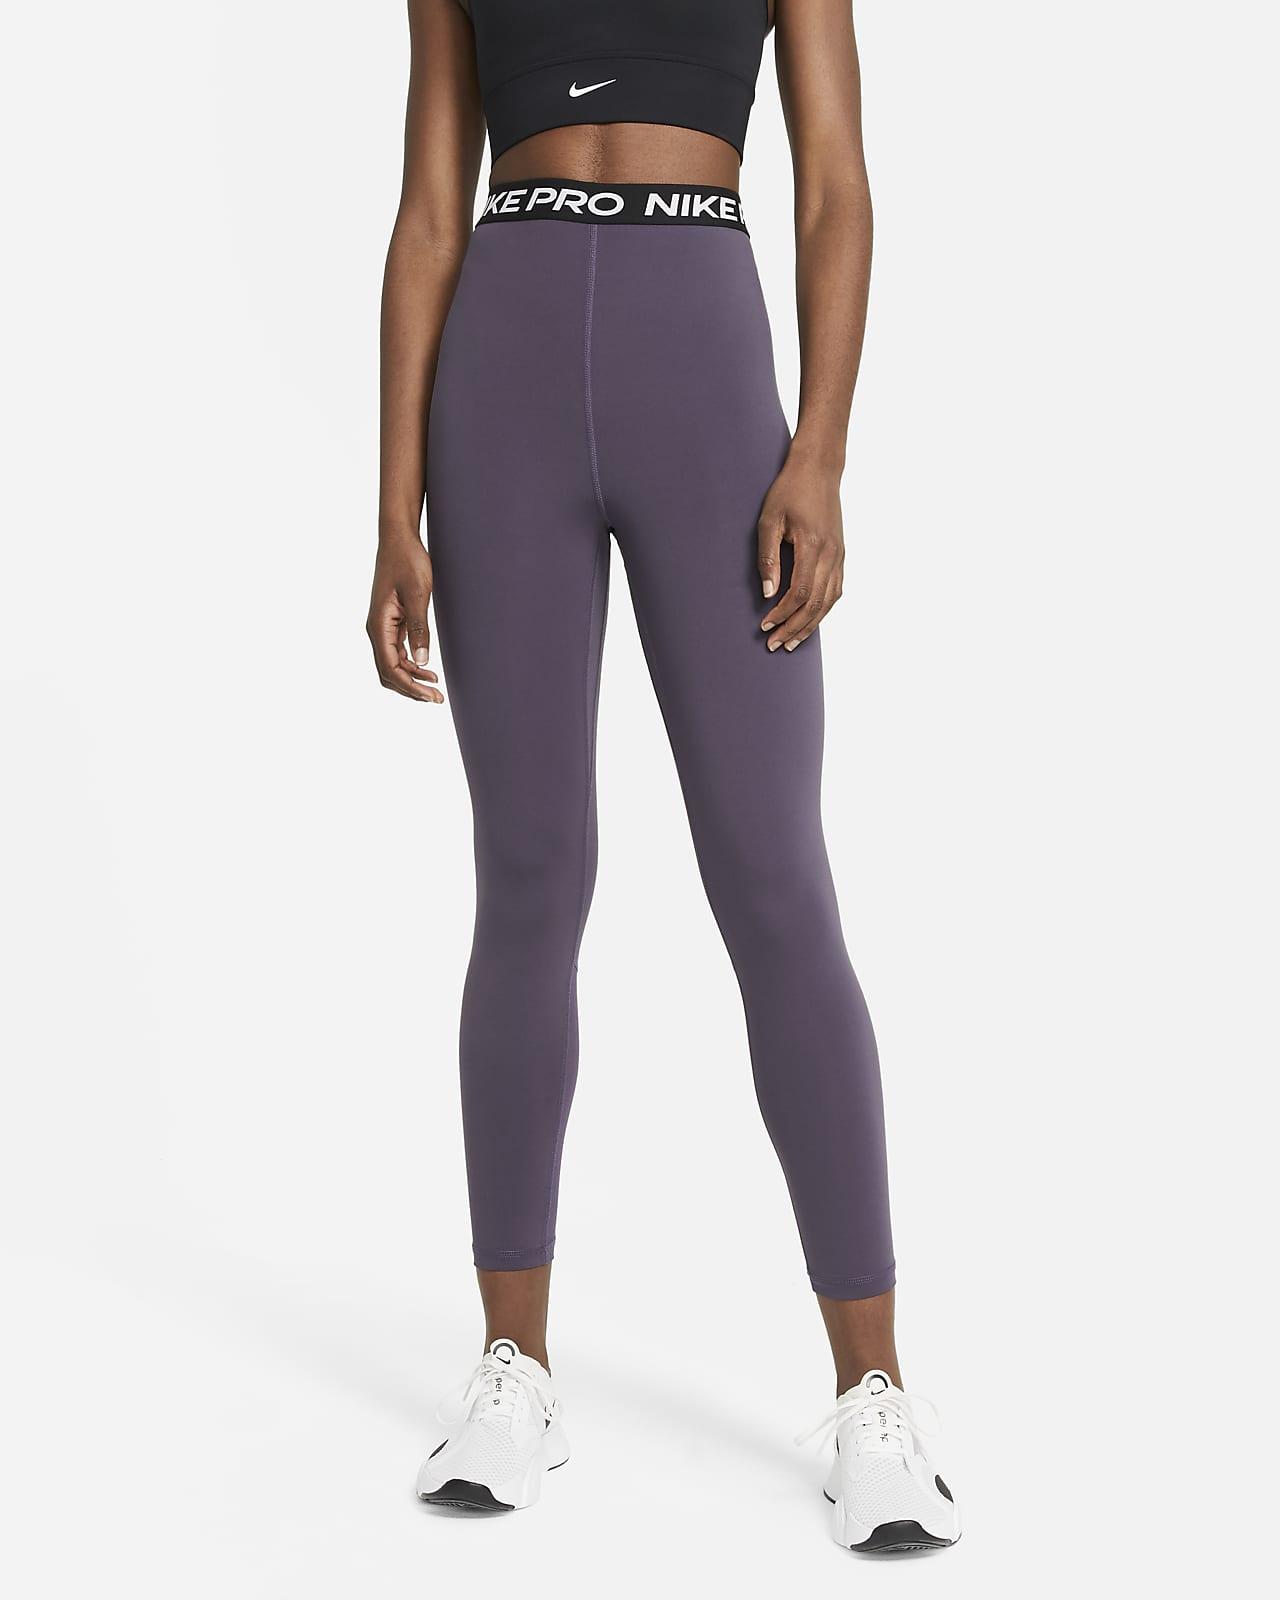 Nike Pro 365 Women's High-Rise 7/8 Leggings